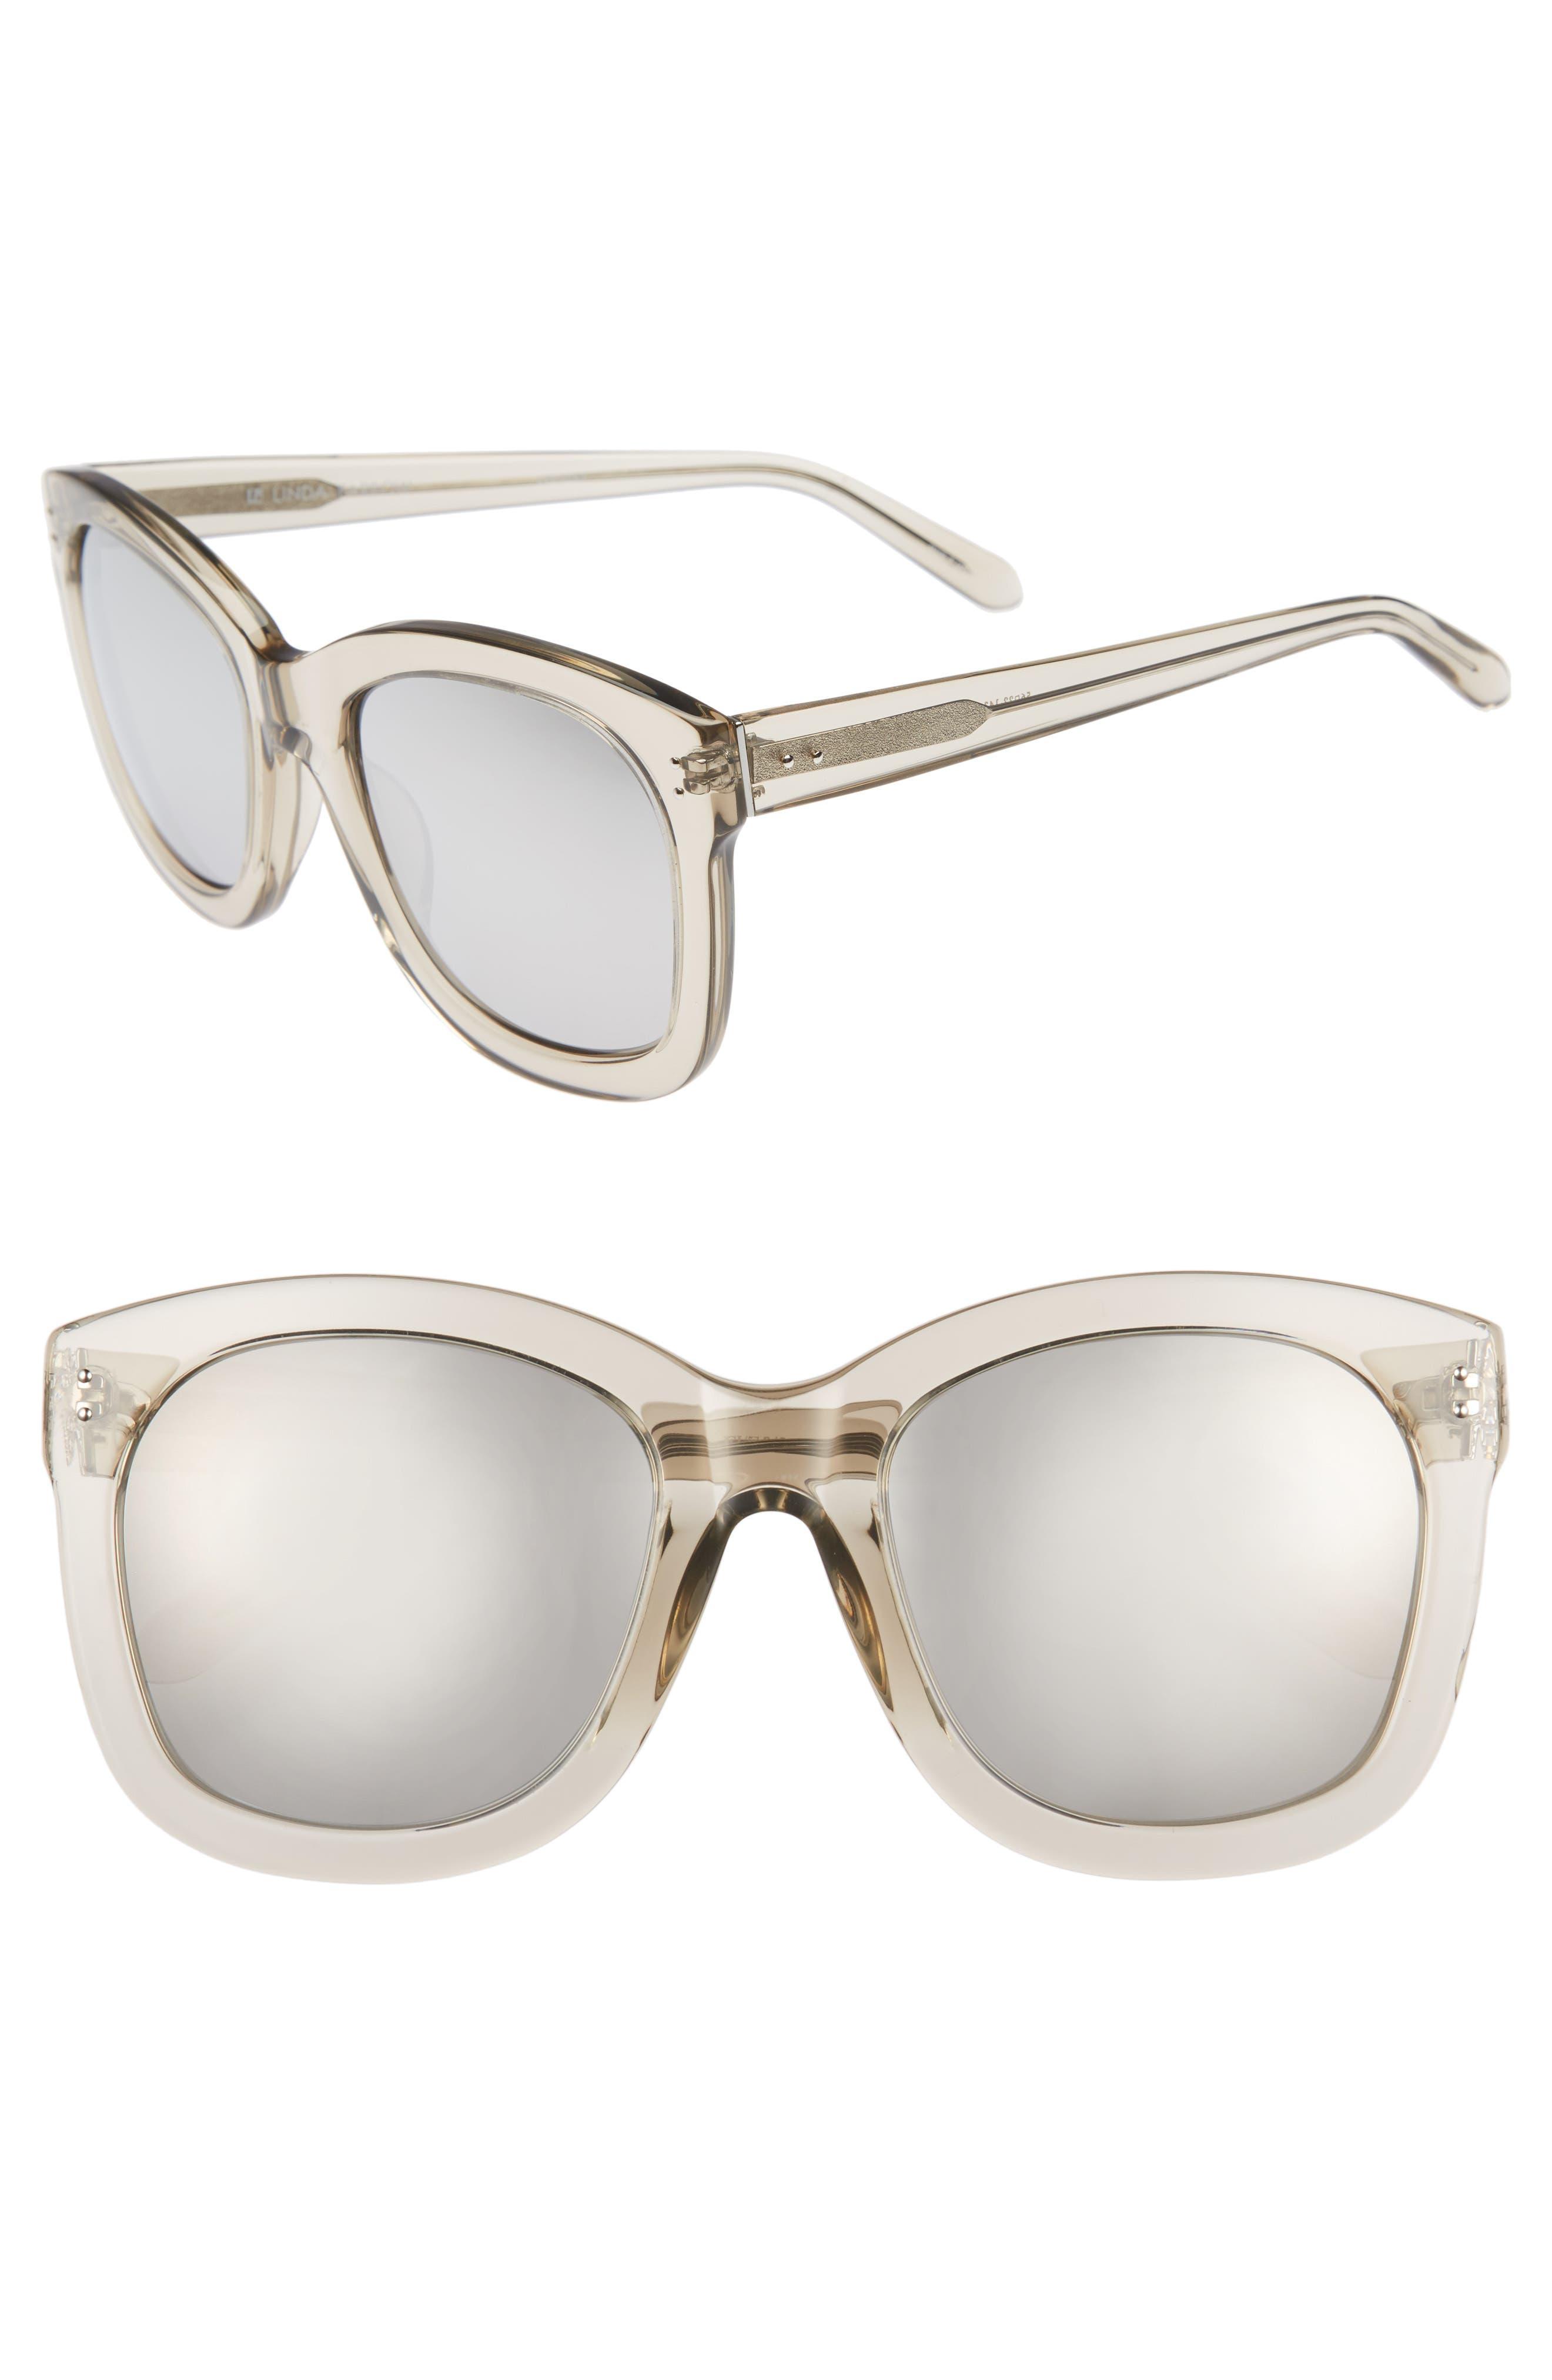 56mm Mirrored Sunglasses,                         Main,                         color, Truffle/ White Gold/ Platinum